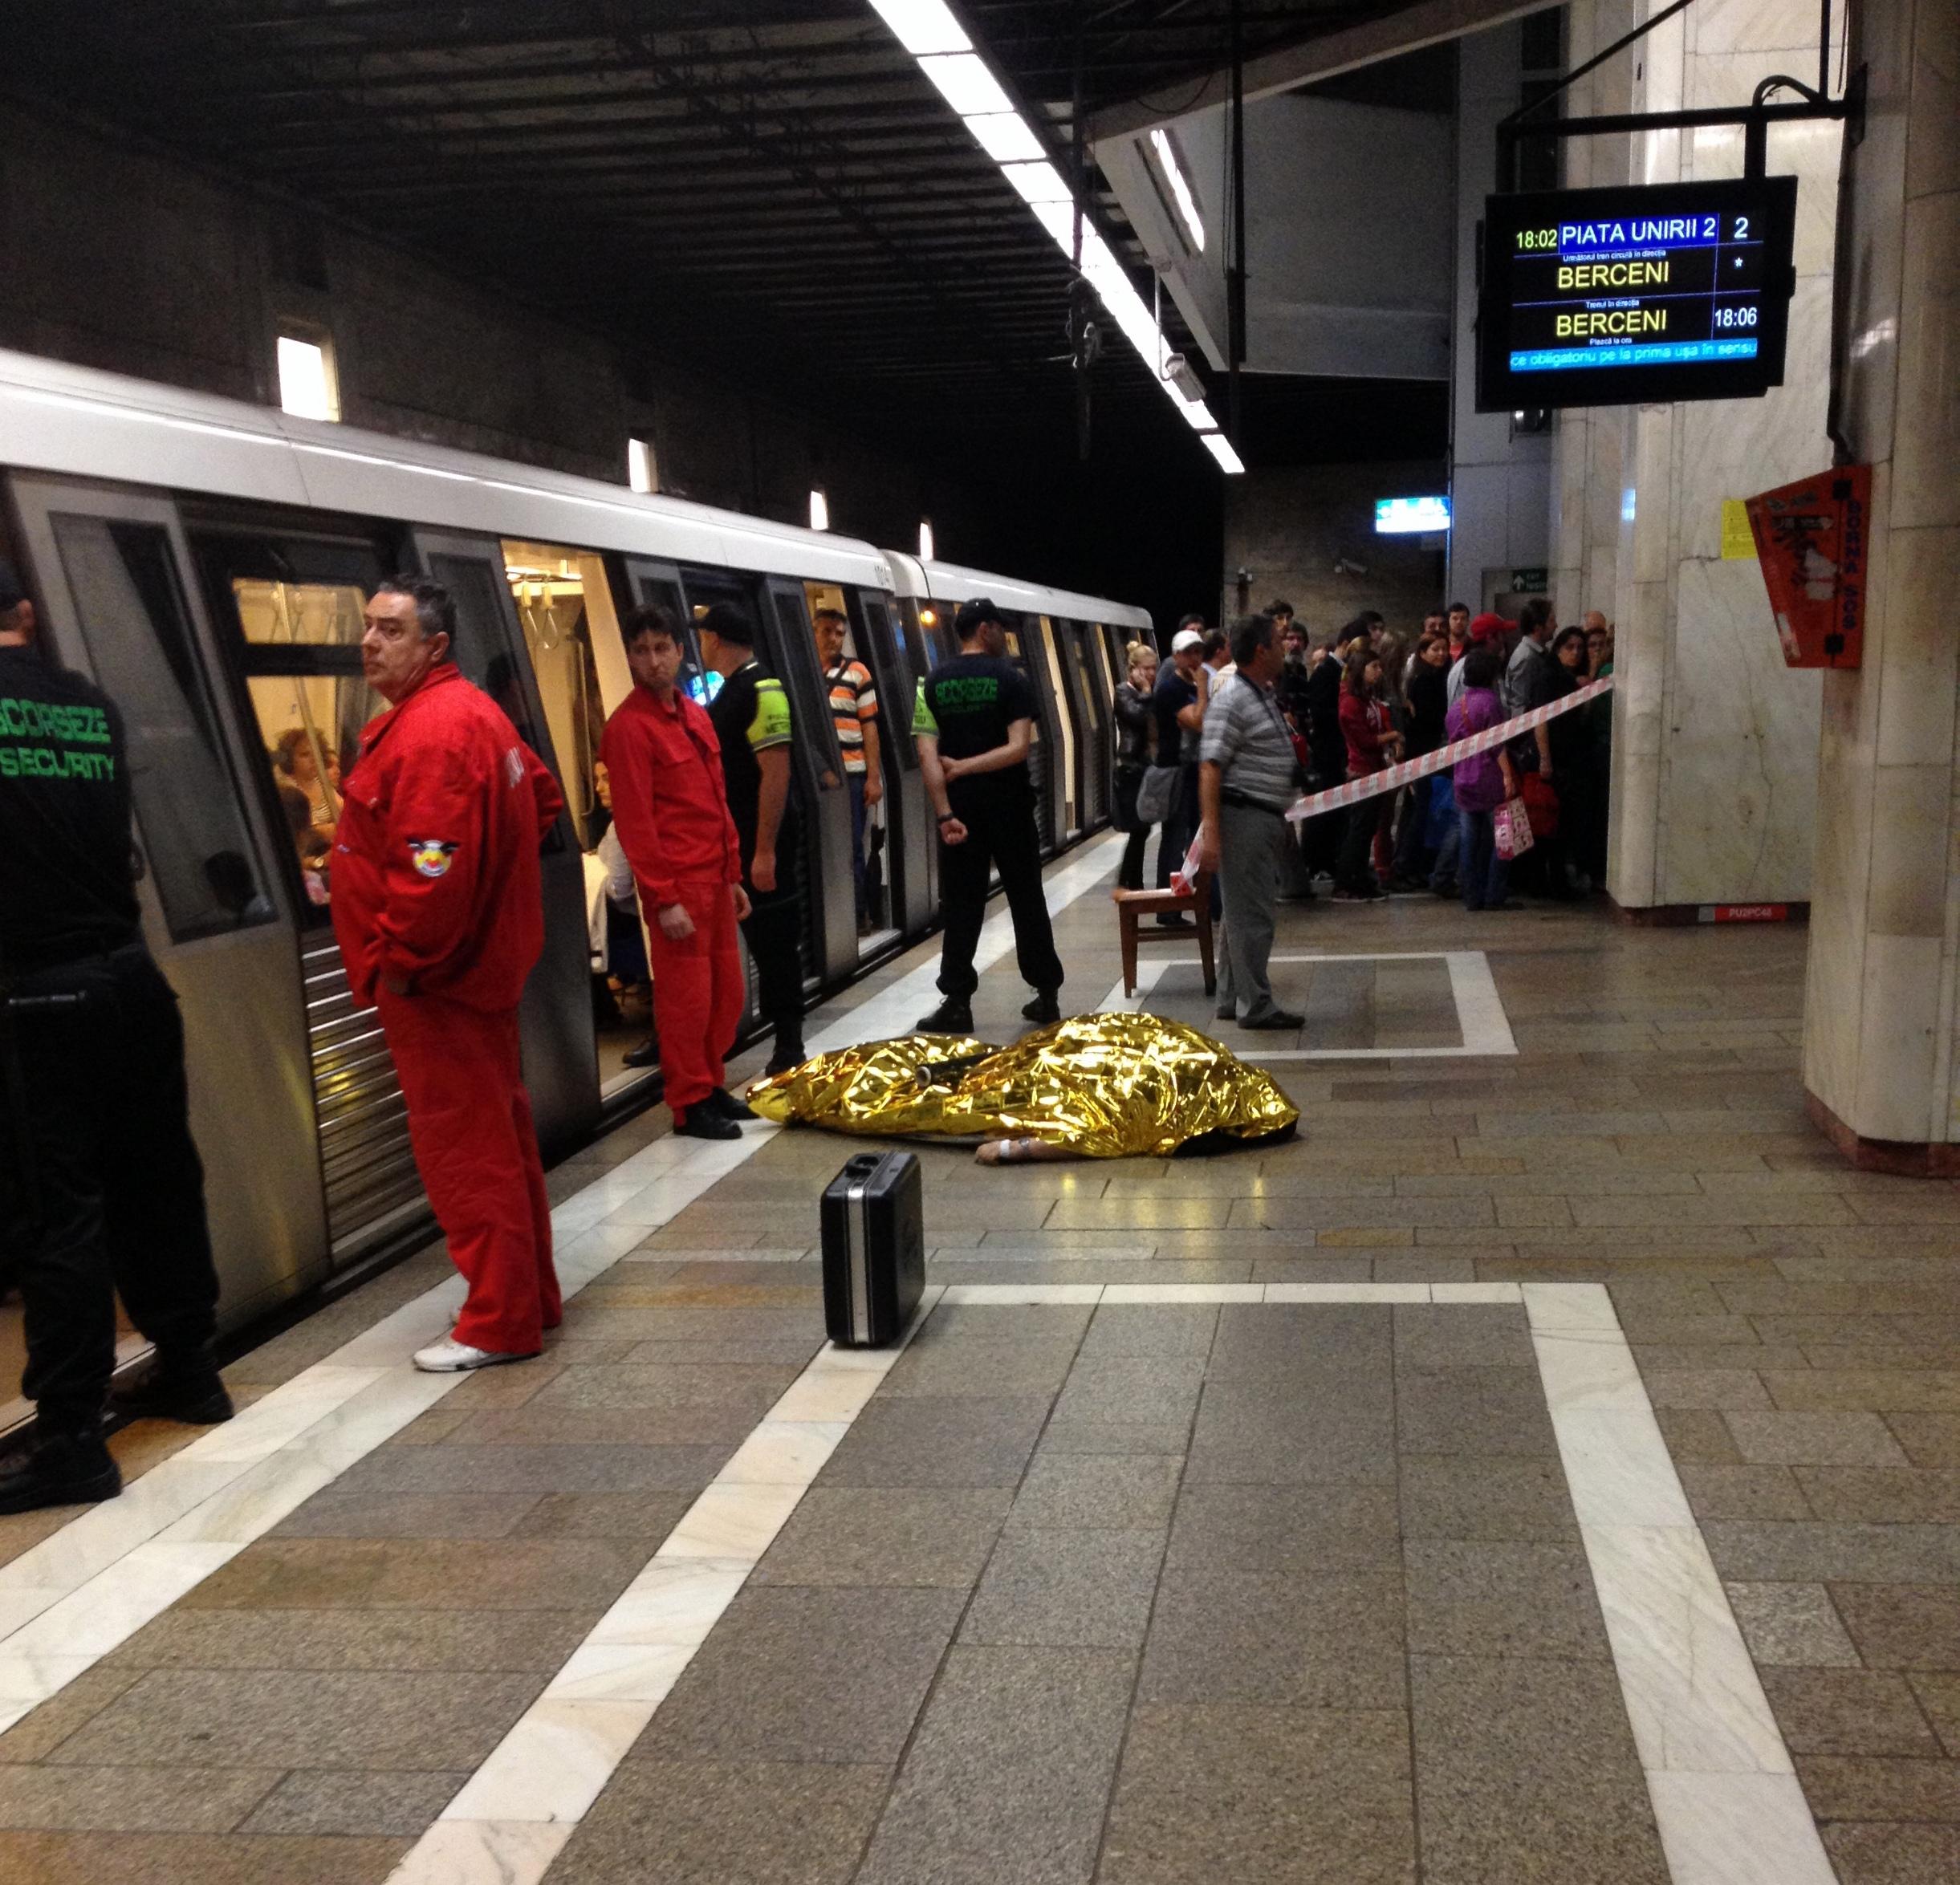 Death on the metro